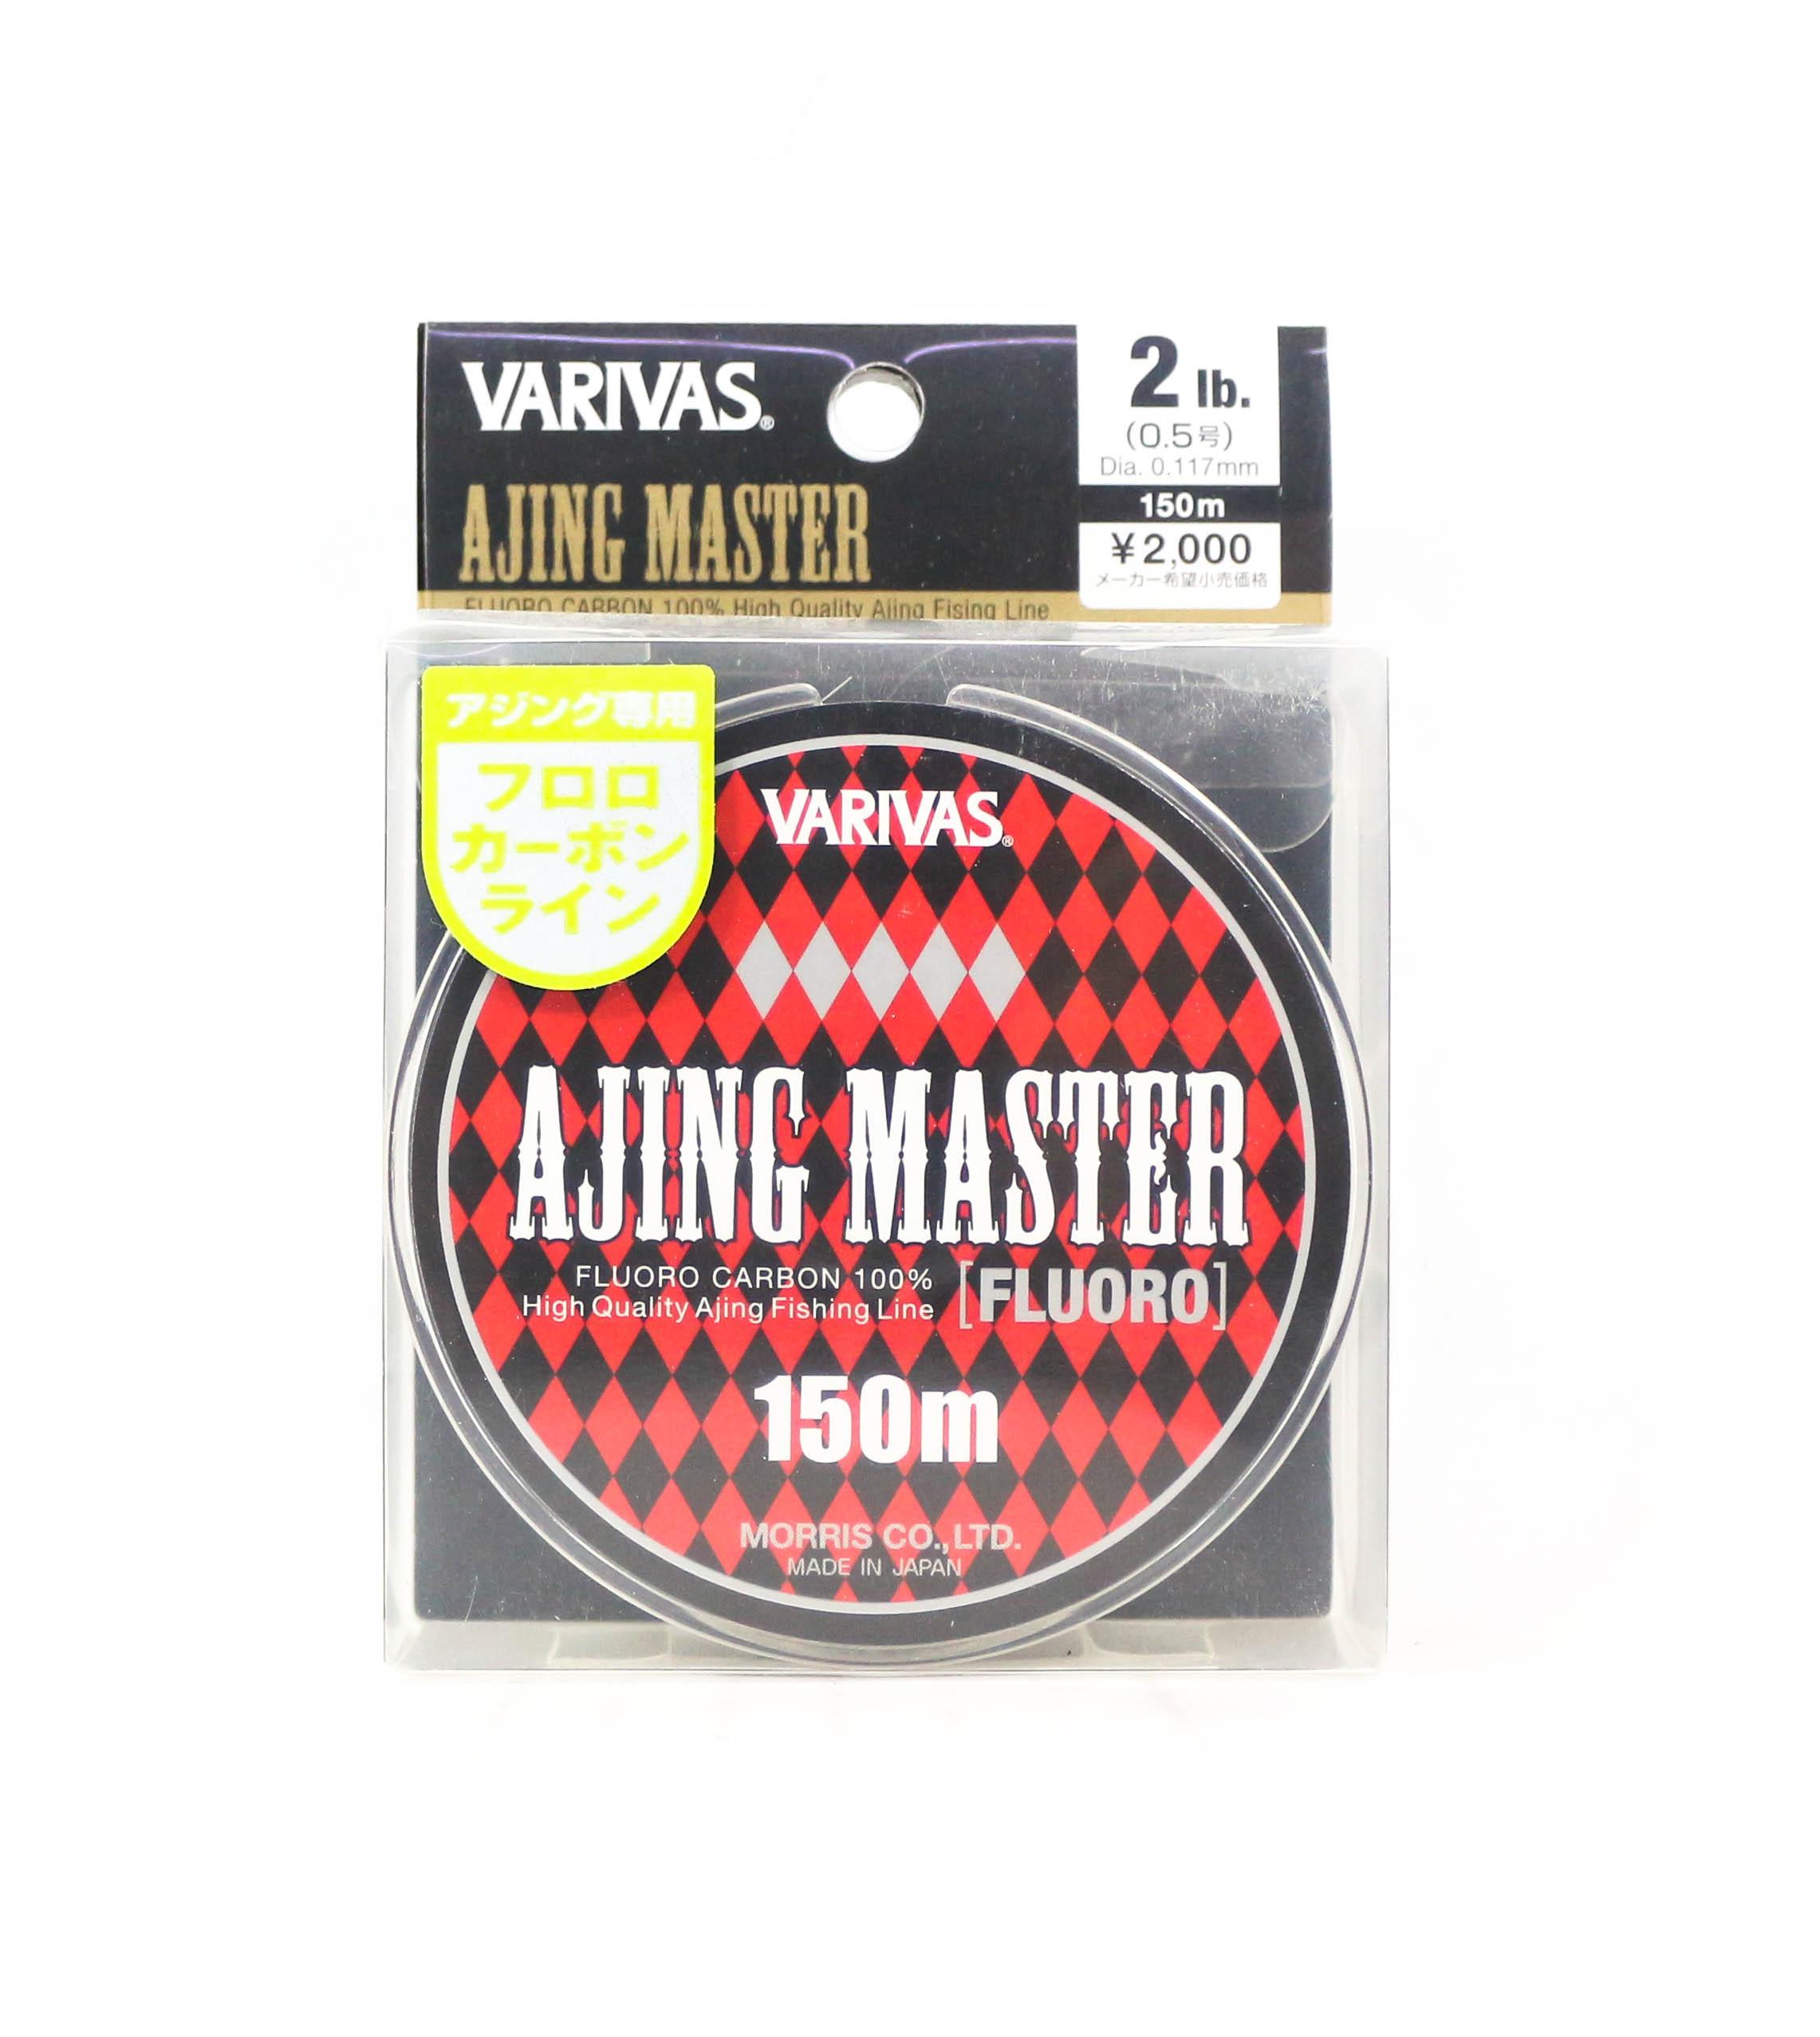 Sale Varivas Fluorocarbon Line Ajing Master 150m P.E 0.5, 2lb (5161)